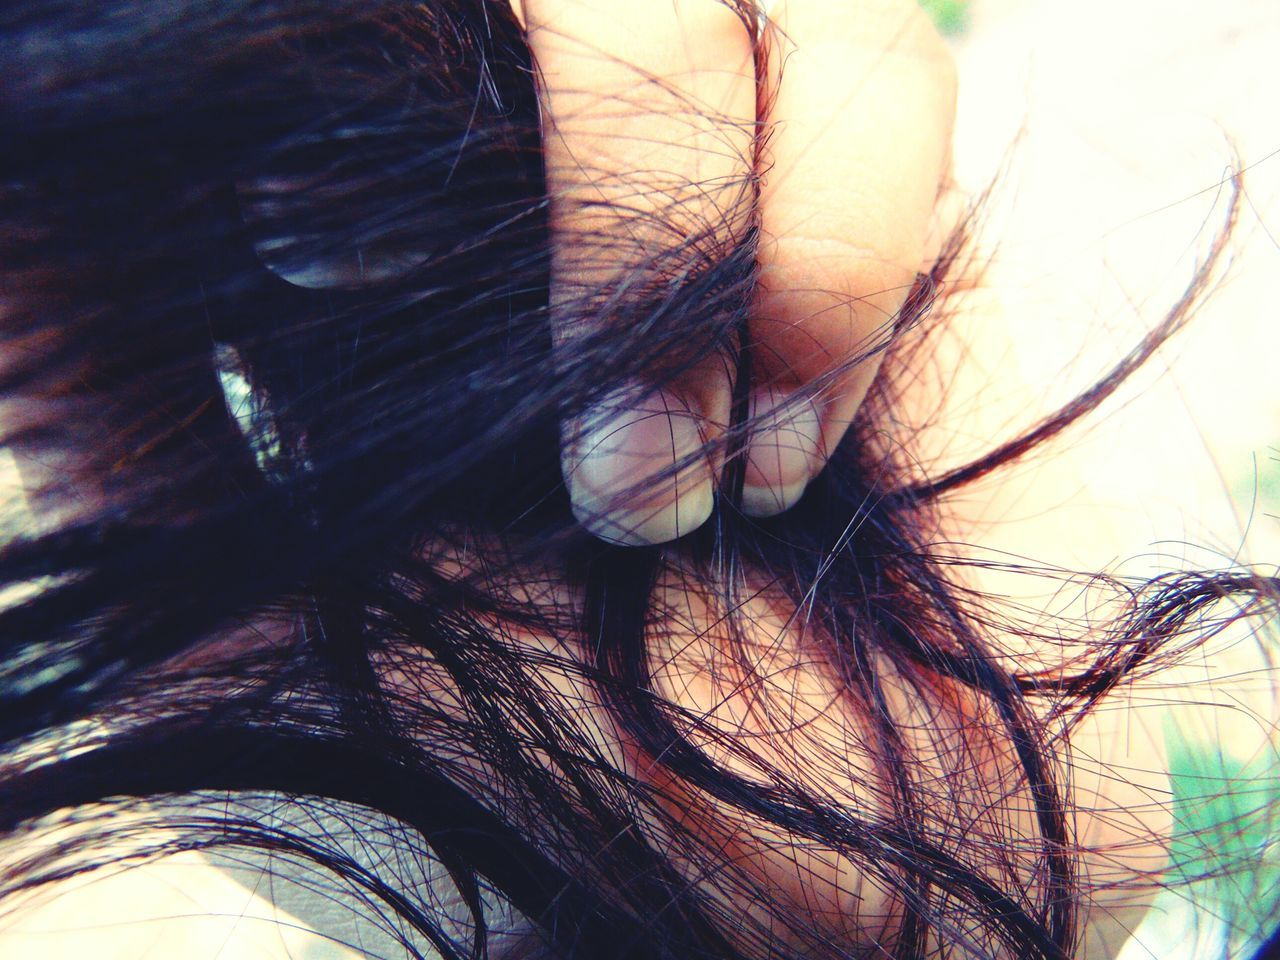 human body part, one person, close-up, real people, human skin, eyelash, indoors, day, human hand, eyeball, people